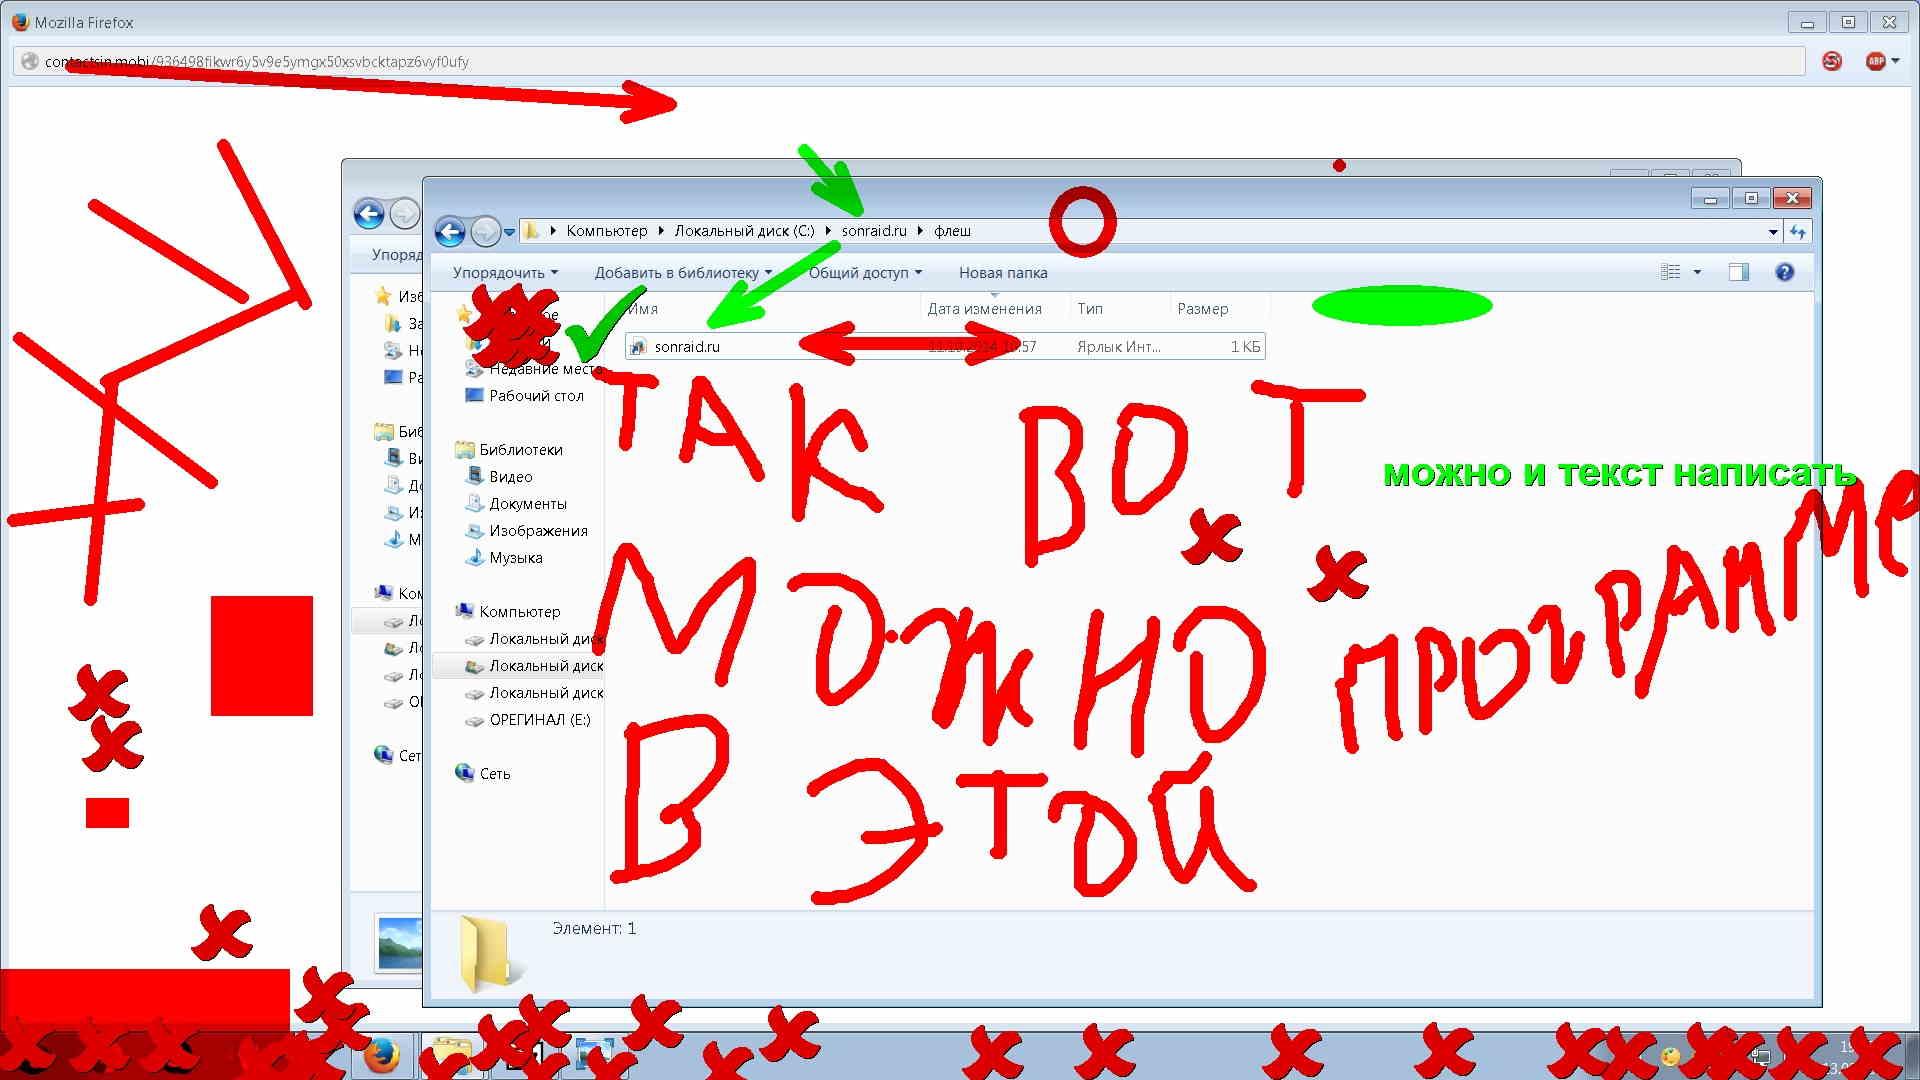 Poin.port.rus1.7.1